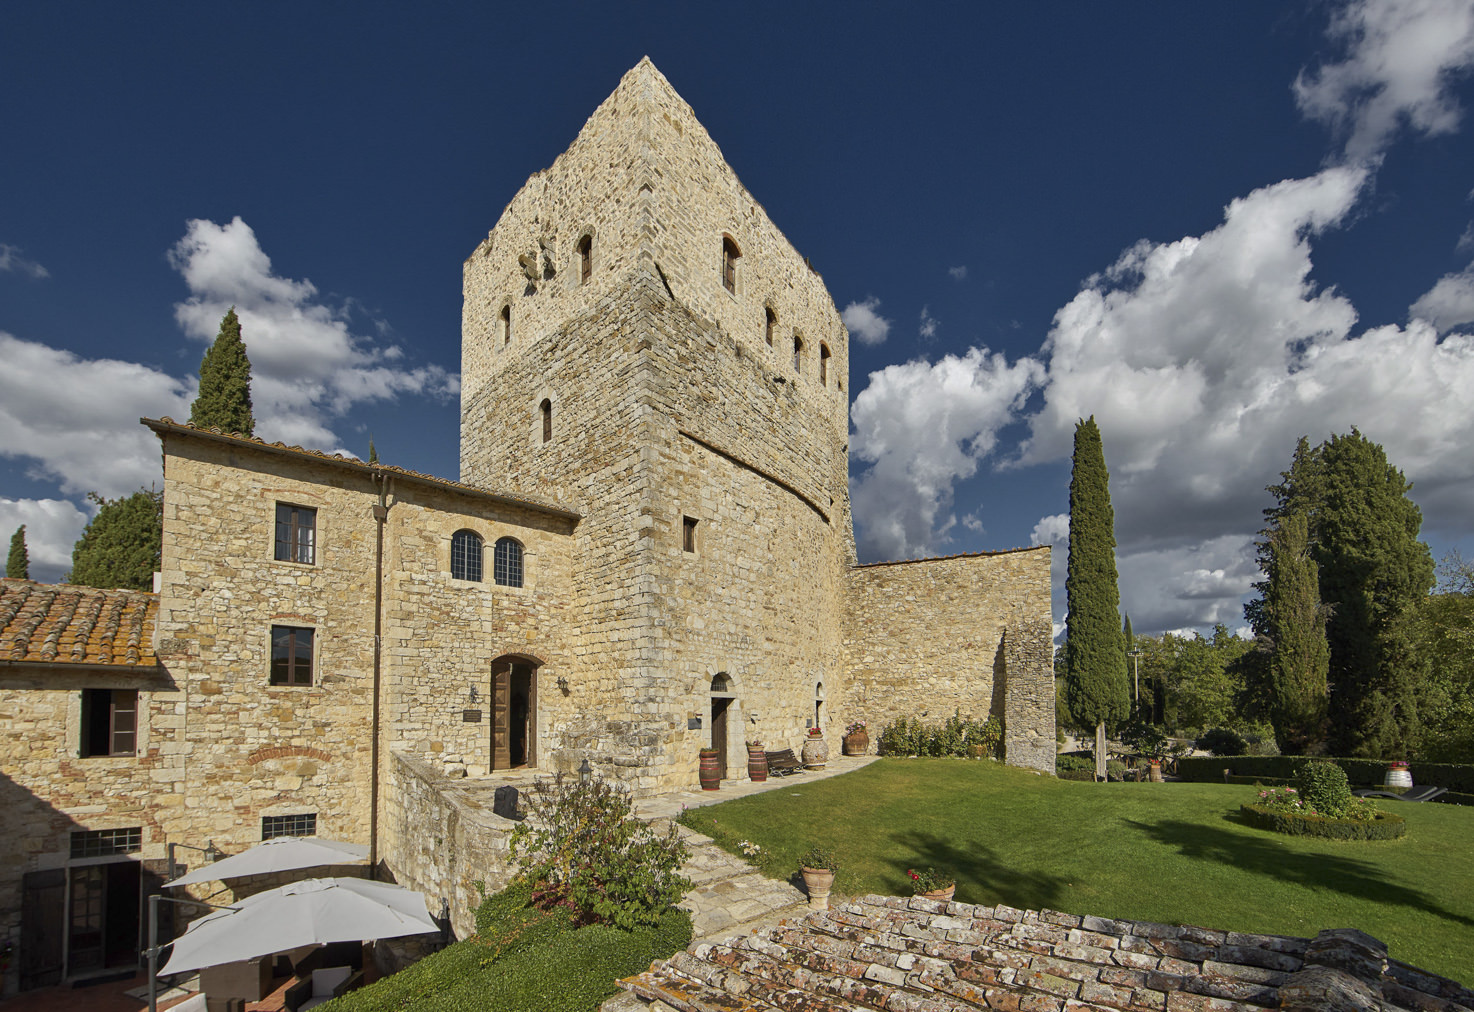 Façade of Castello di Tornano, Tuscany